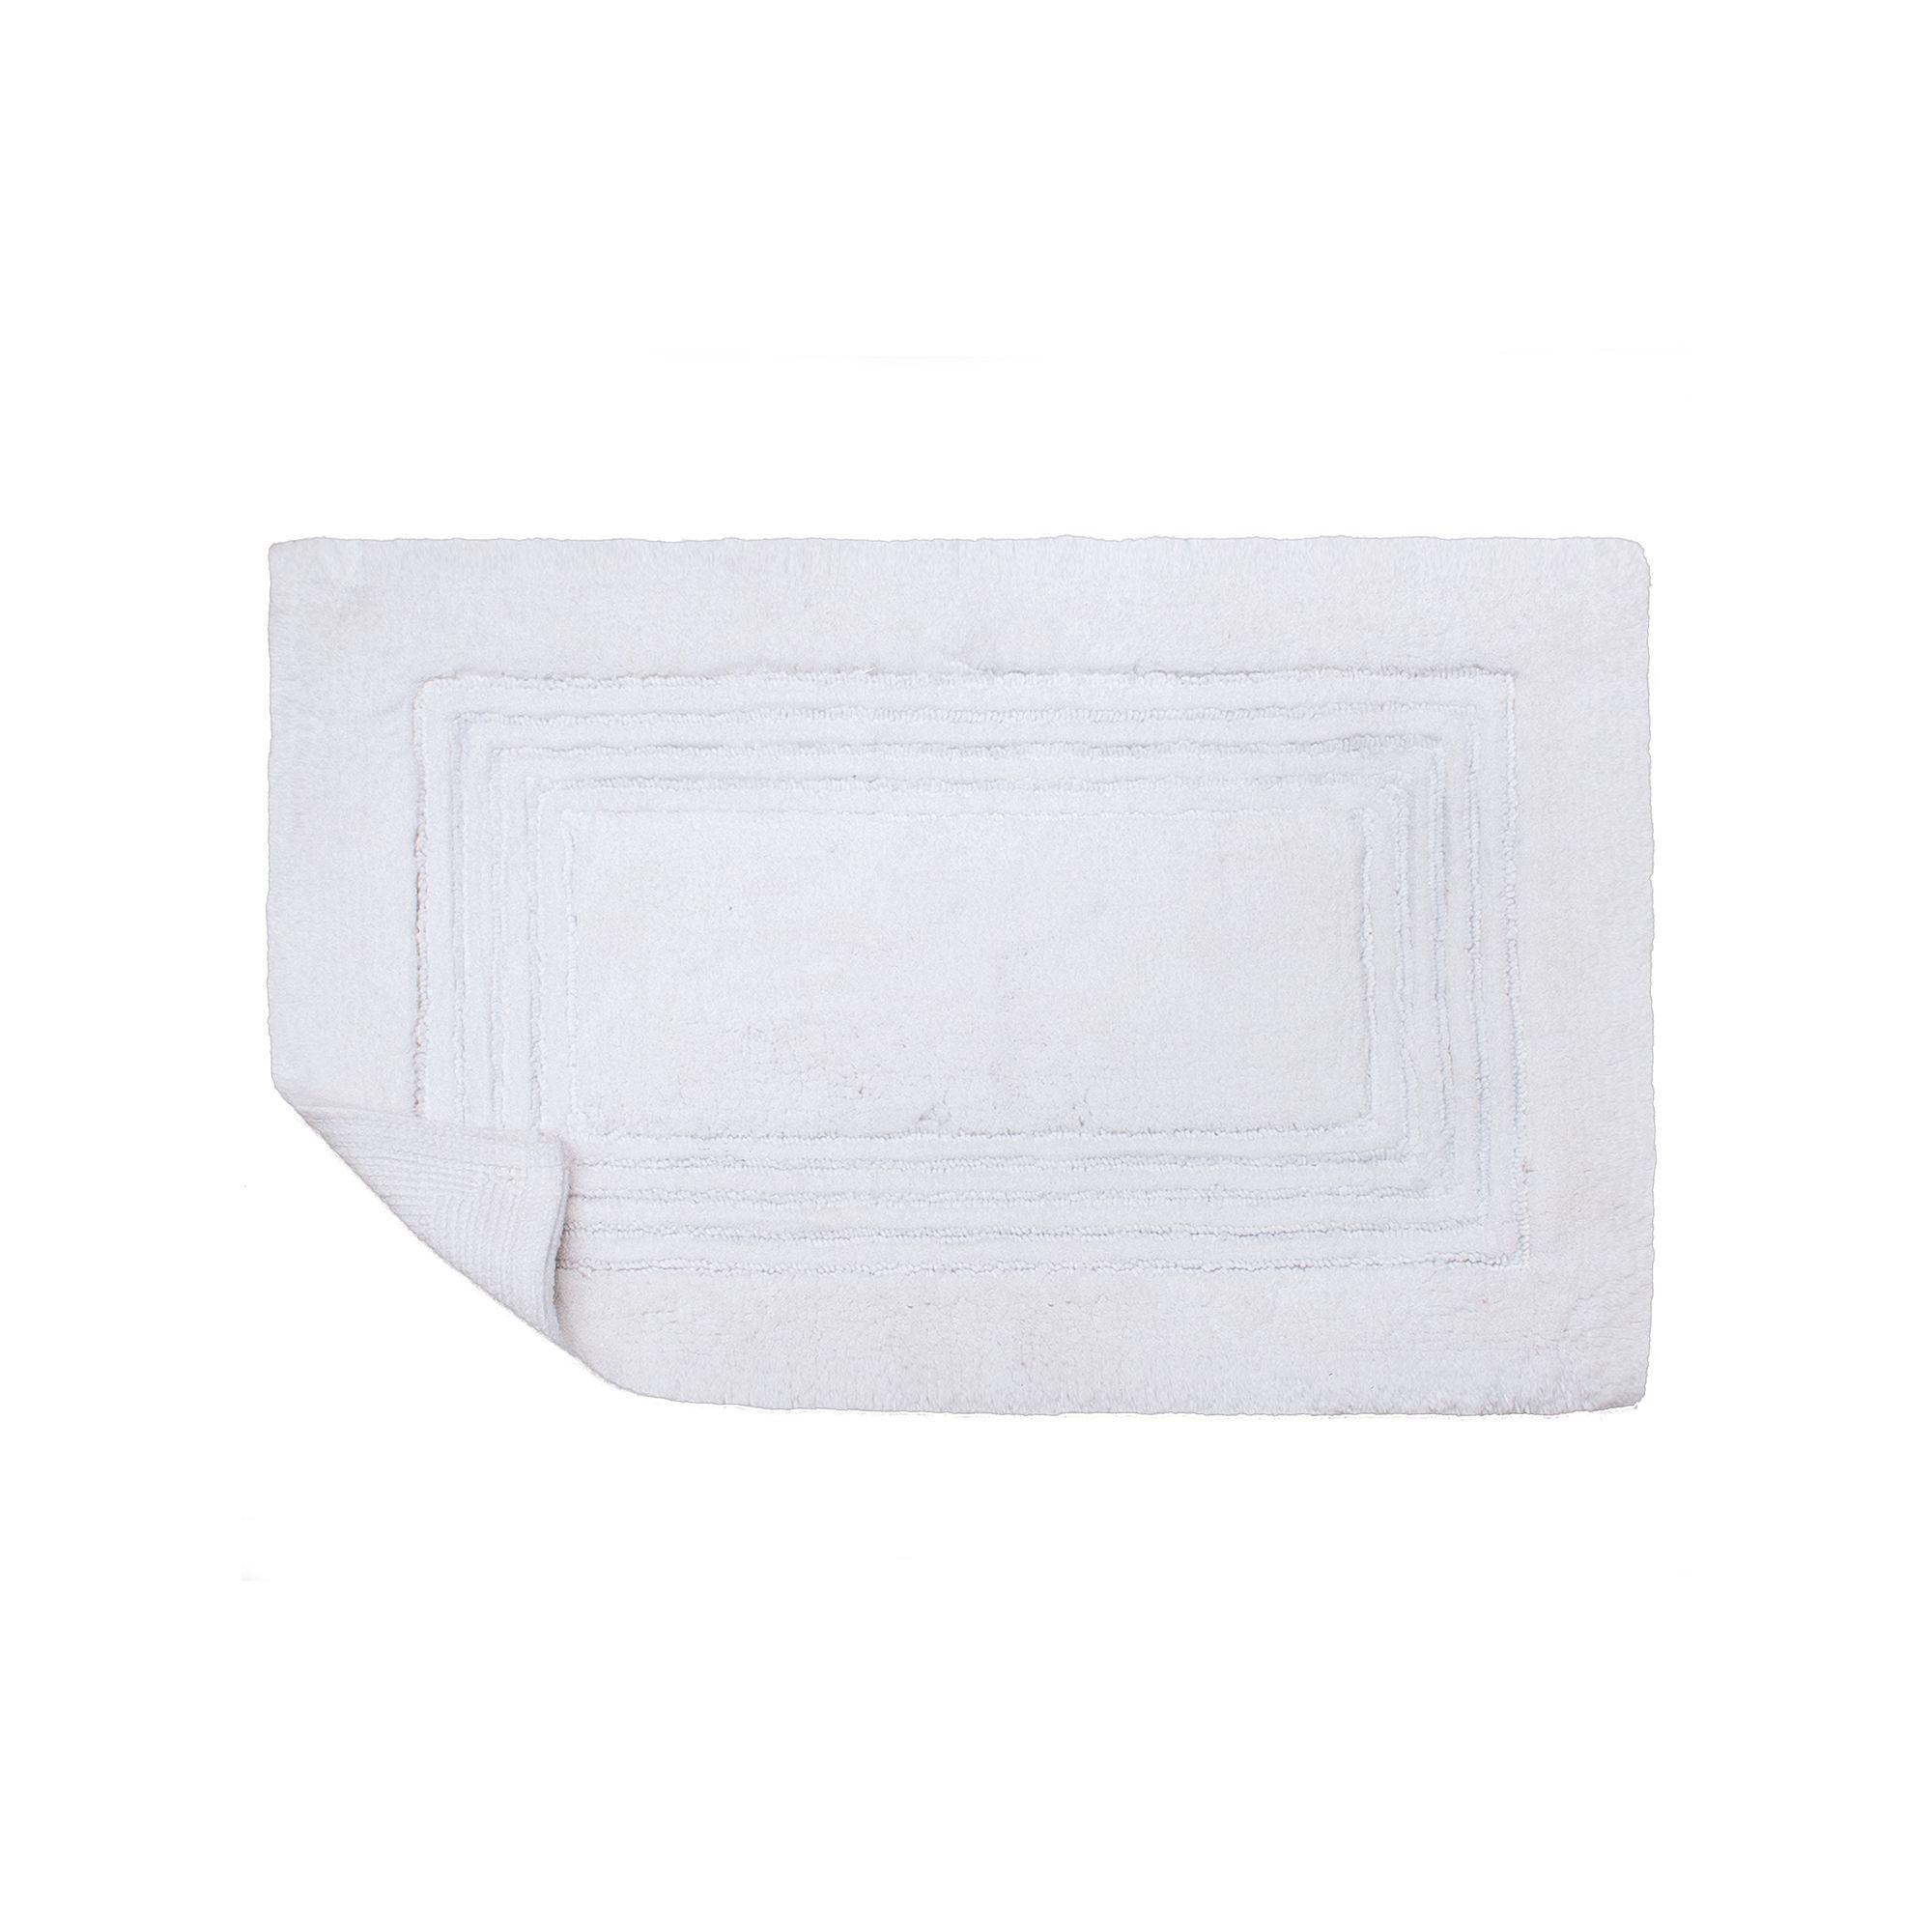 microcotton 17'' x 24'' bath rug, grey | products, rugs and bath rugs